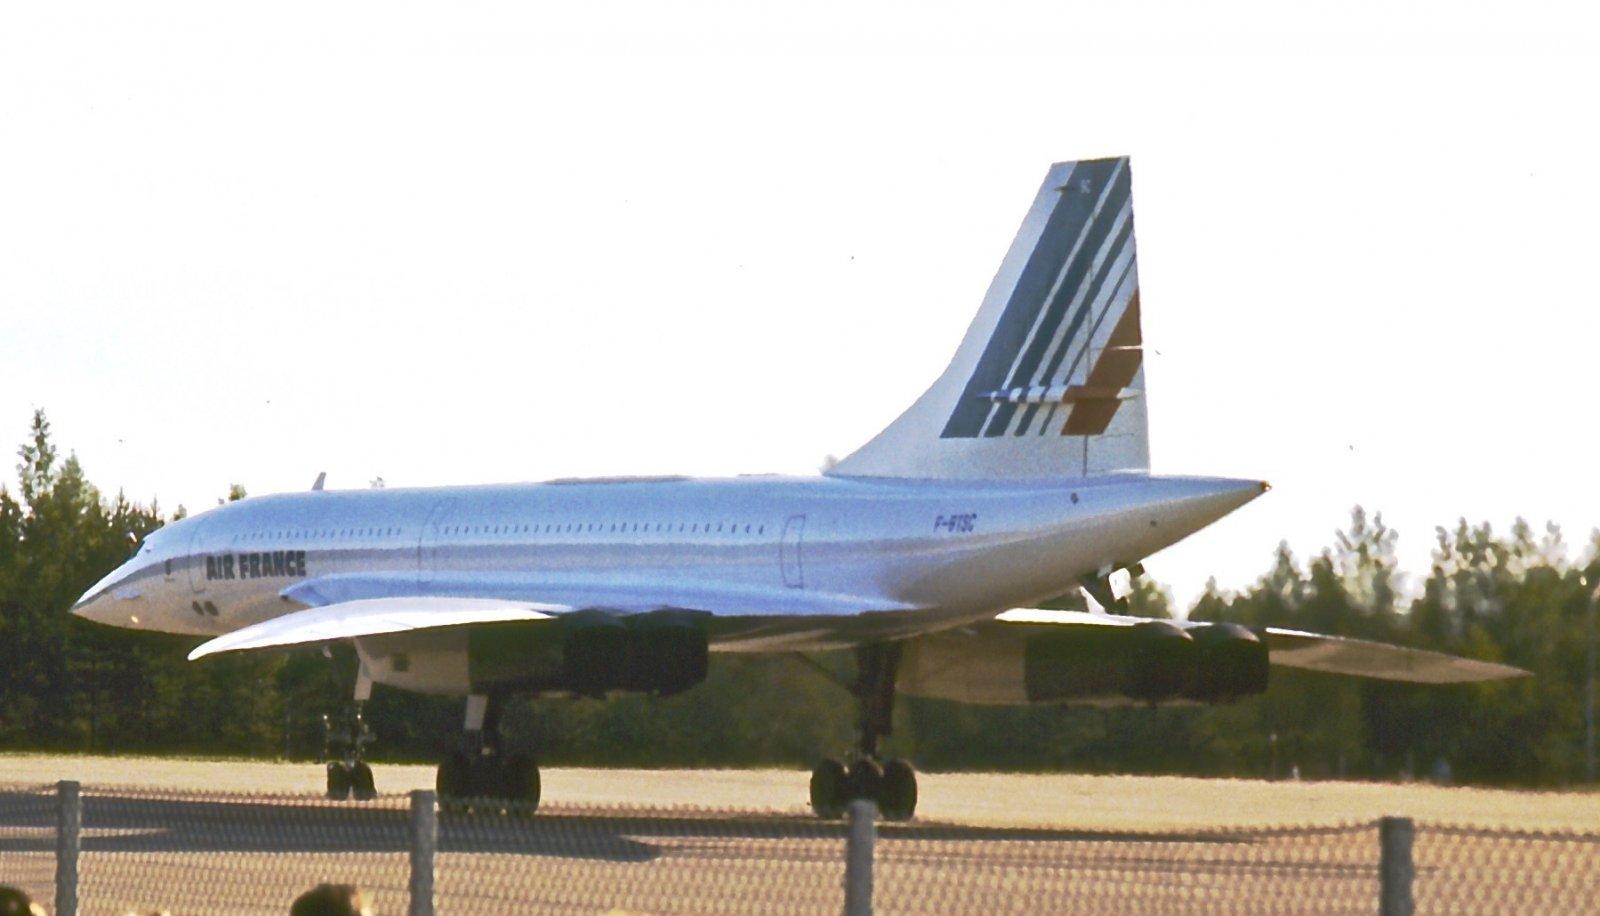 BAC/Aérospatiale Concorde 101 F-BTSC EFTU 1987-07-02